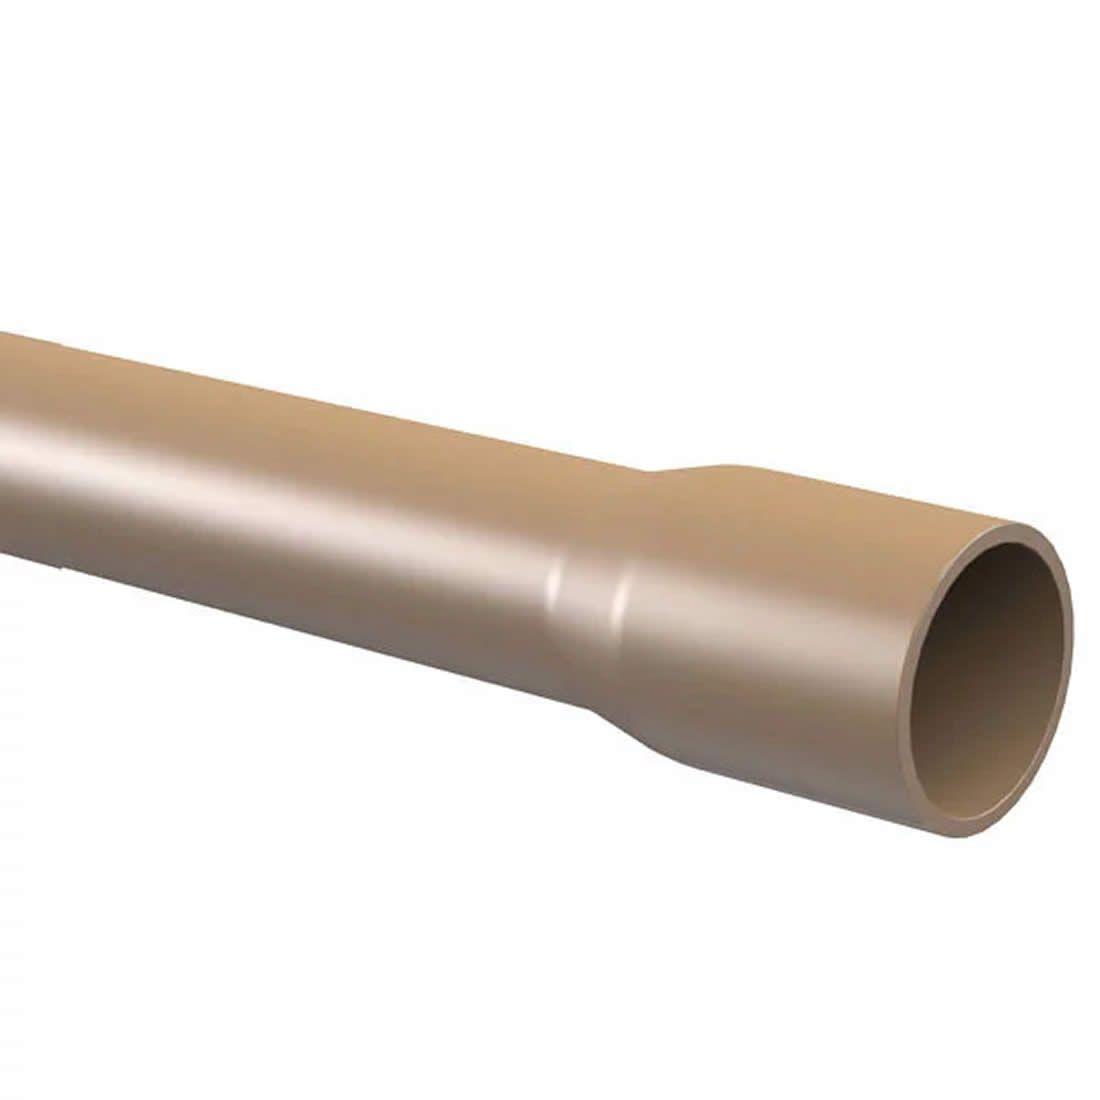 Tubo PVC Soldável 40mm X 6 Metros Tigre